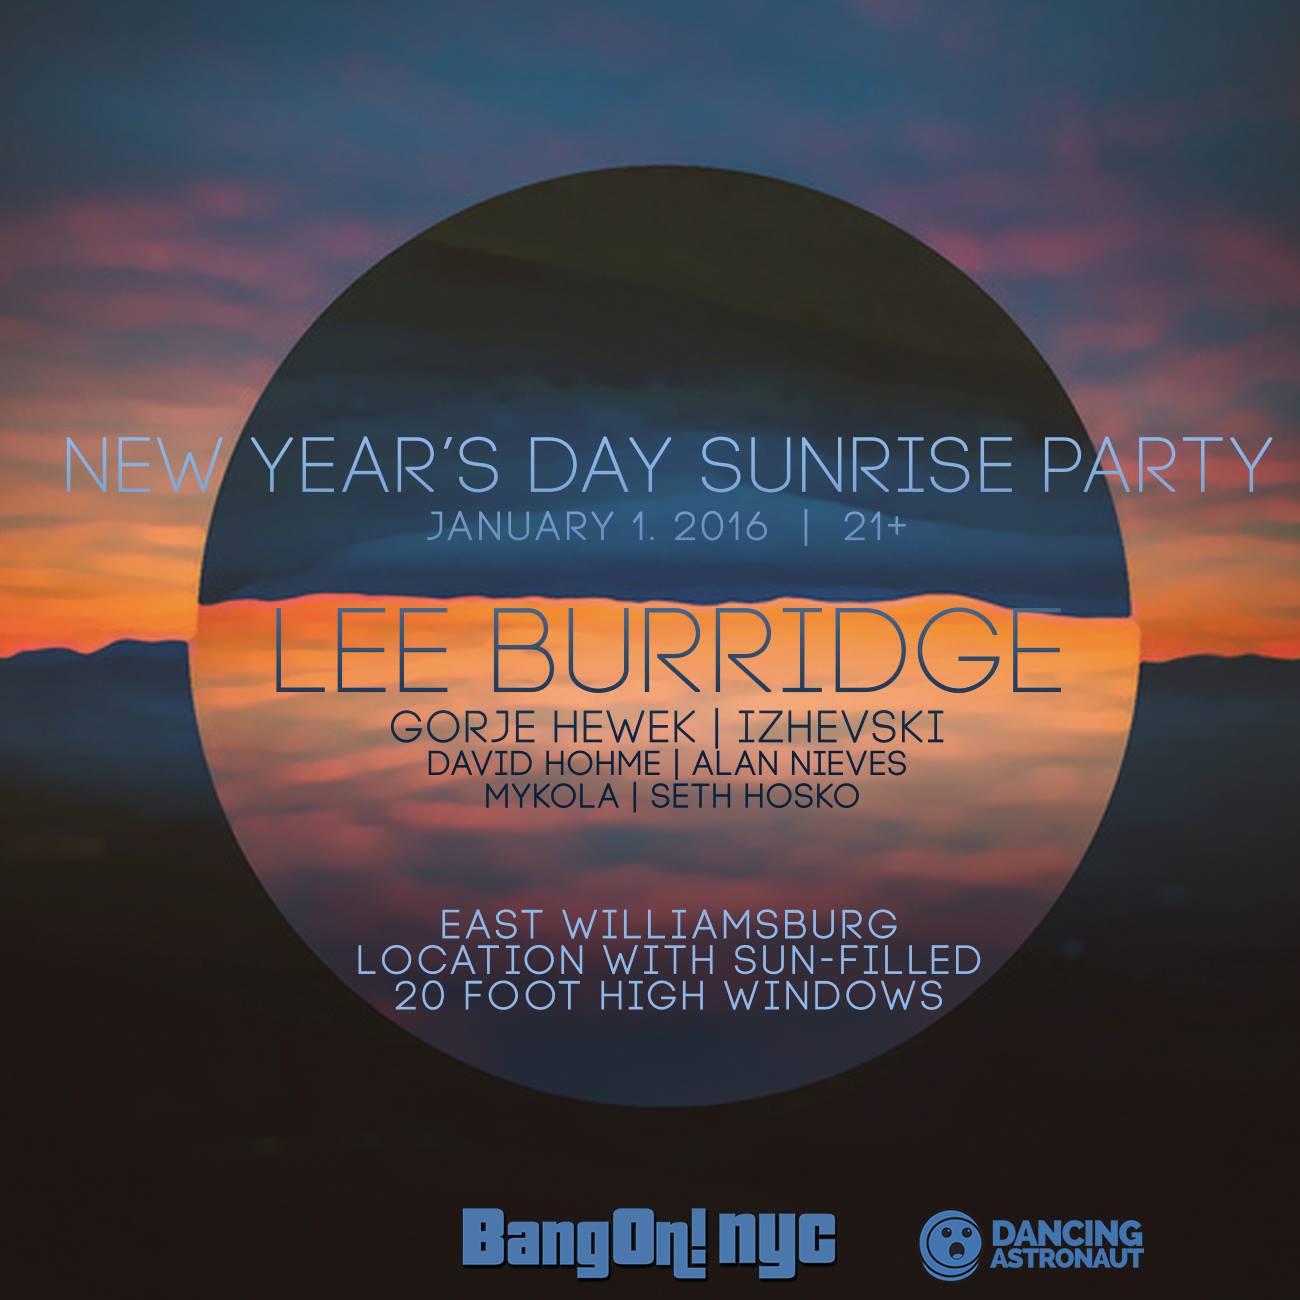 DA Exclusive: New Year's Day Sunrise Party with Lee Burridge mixed by Gorje Hewek & Izhevski12273696 905777476173255 88995669935846155 O